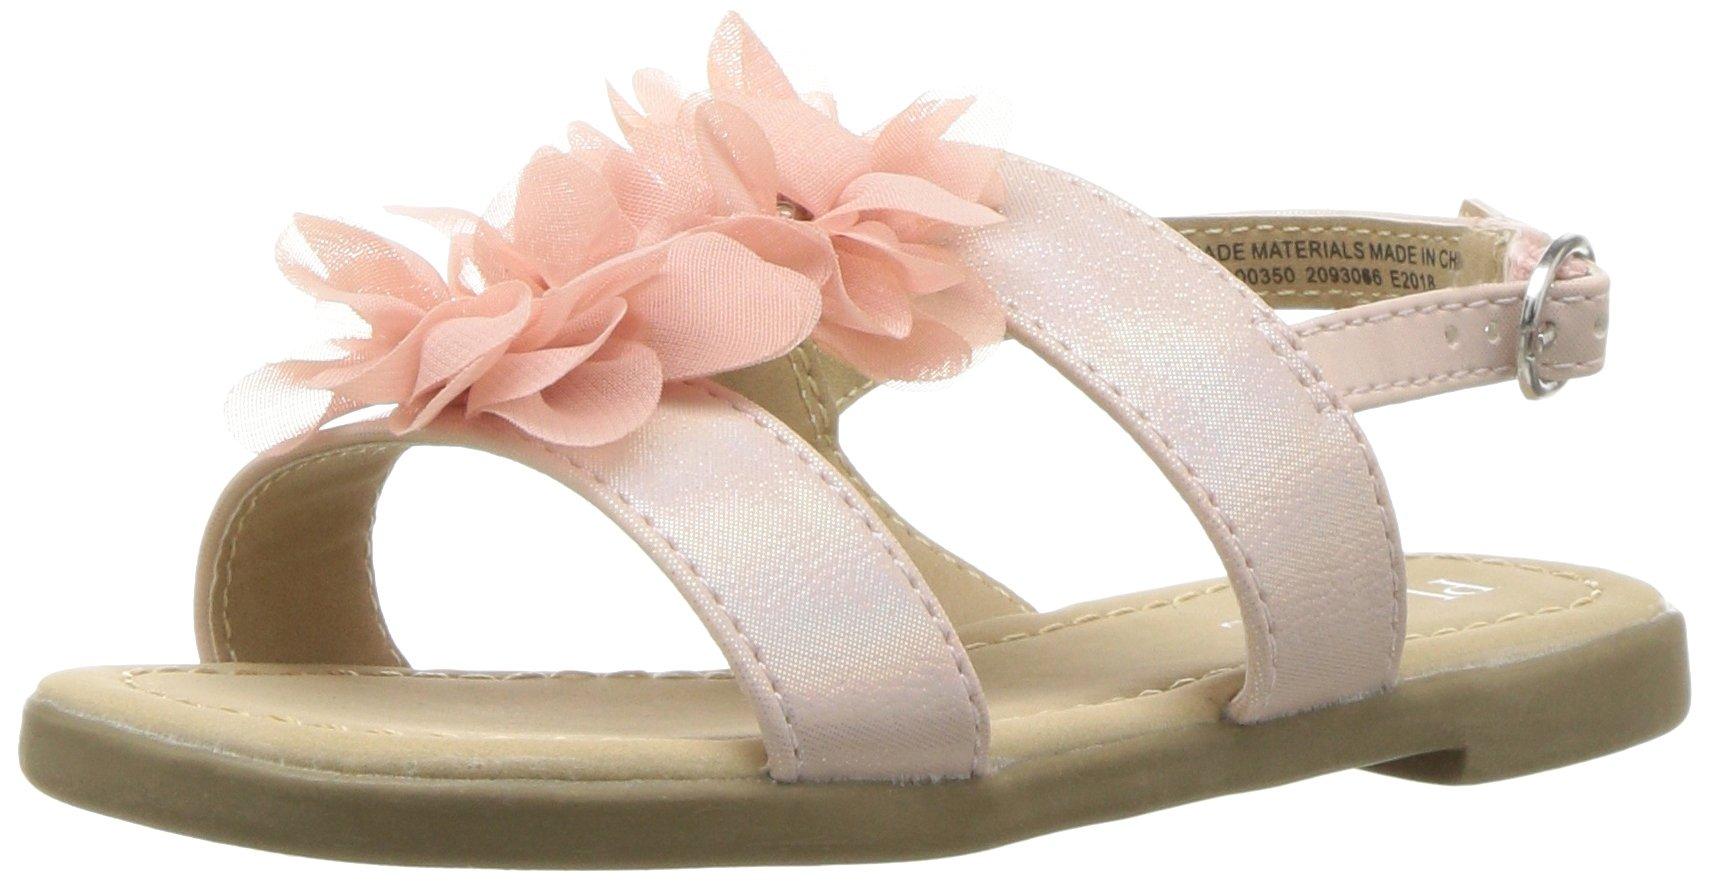 The Children's Place Girls' Flat Sandal, Pink-Slipper-1, TDDLR 11 Medium US Big Kid